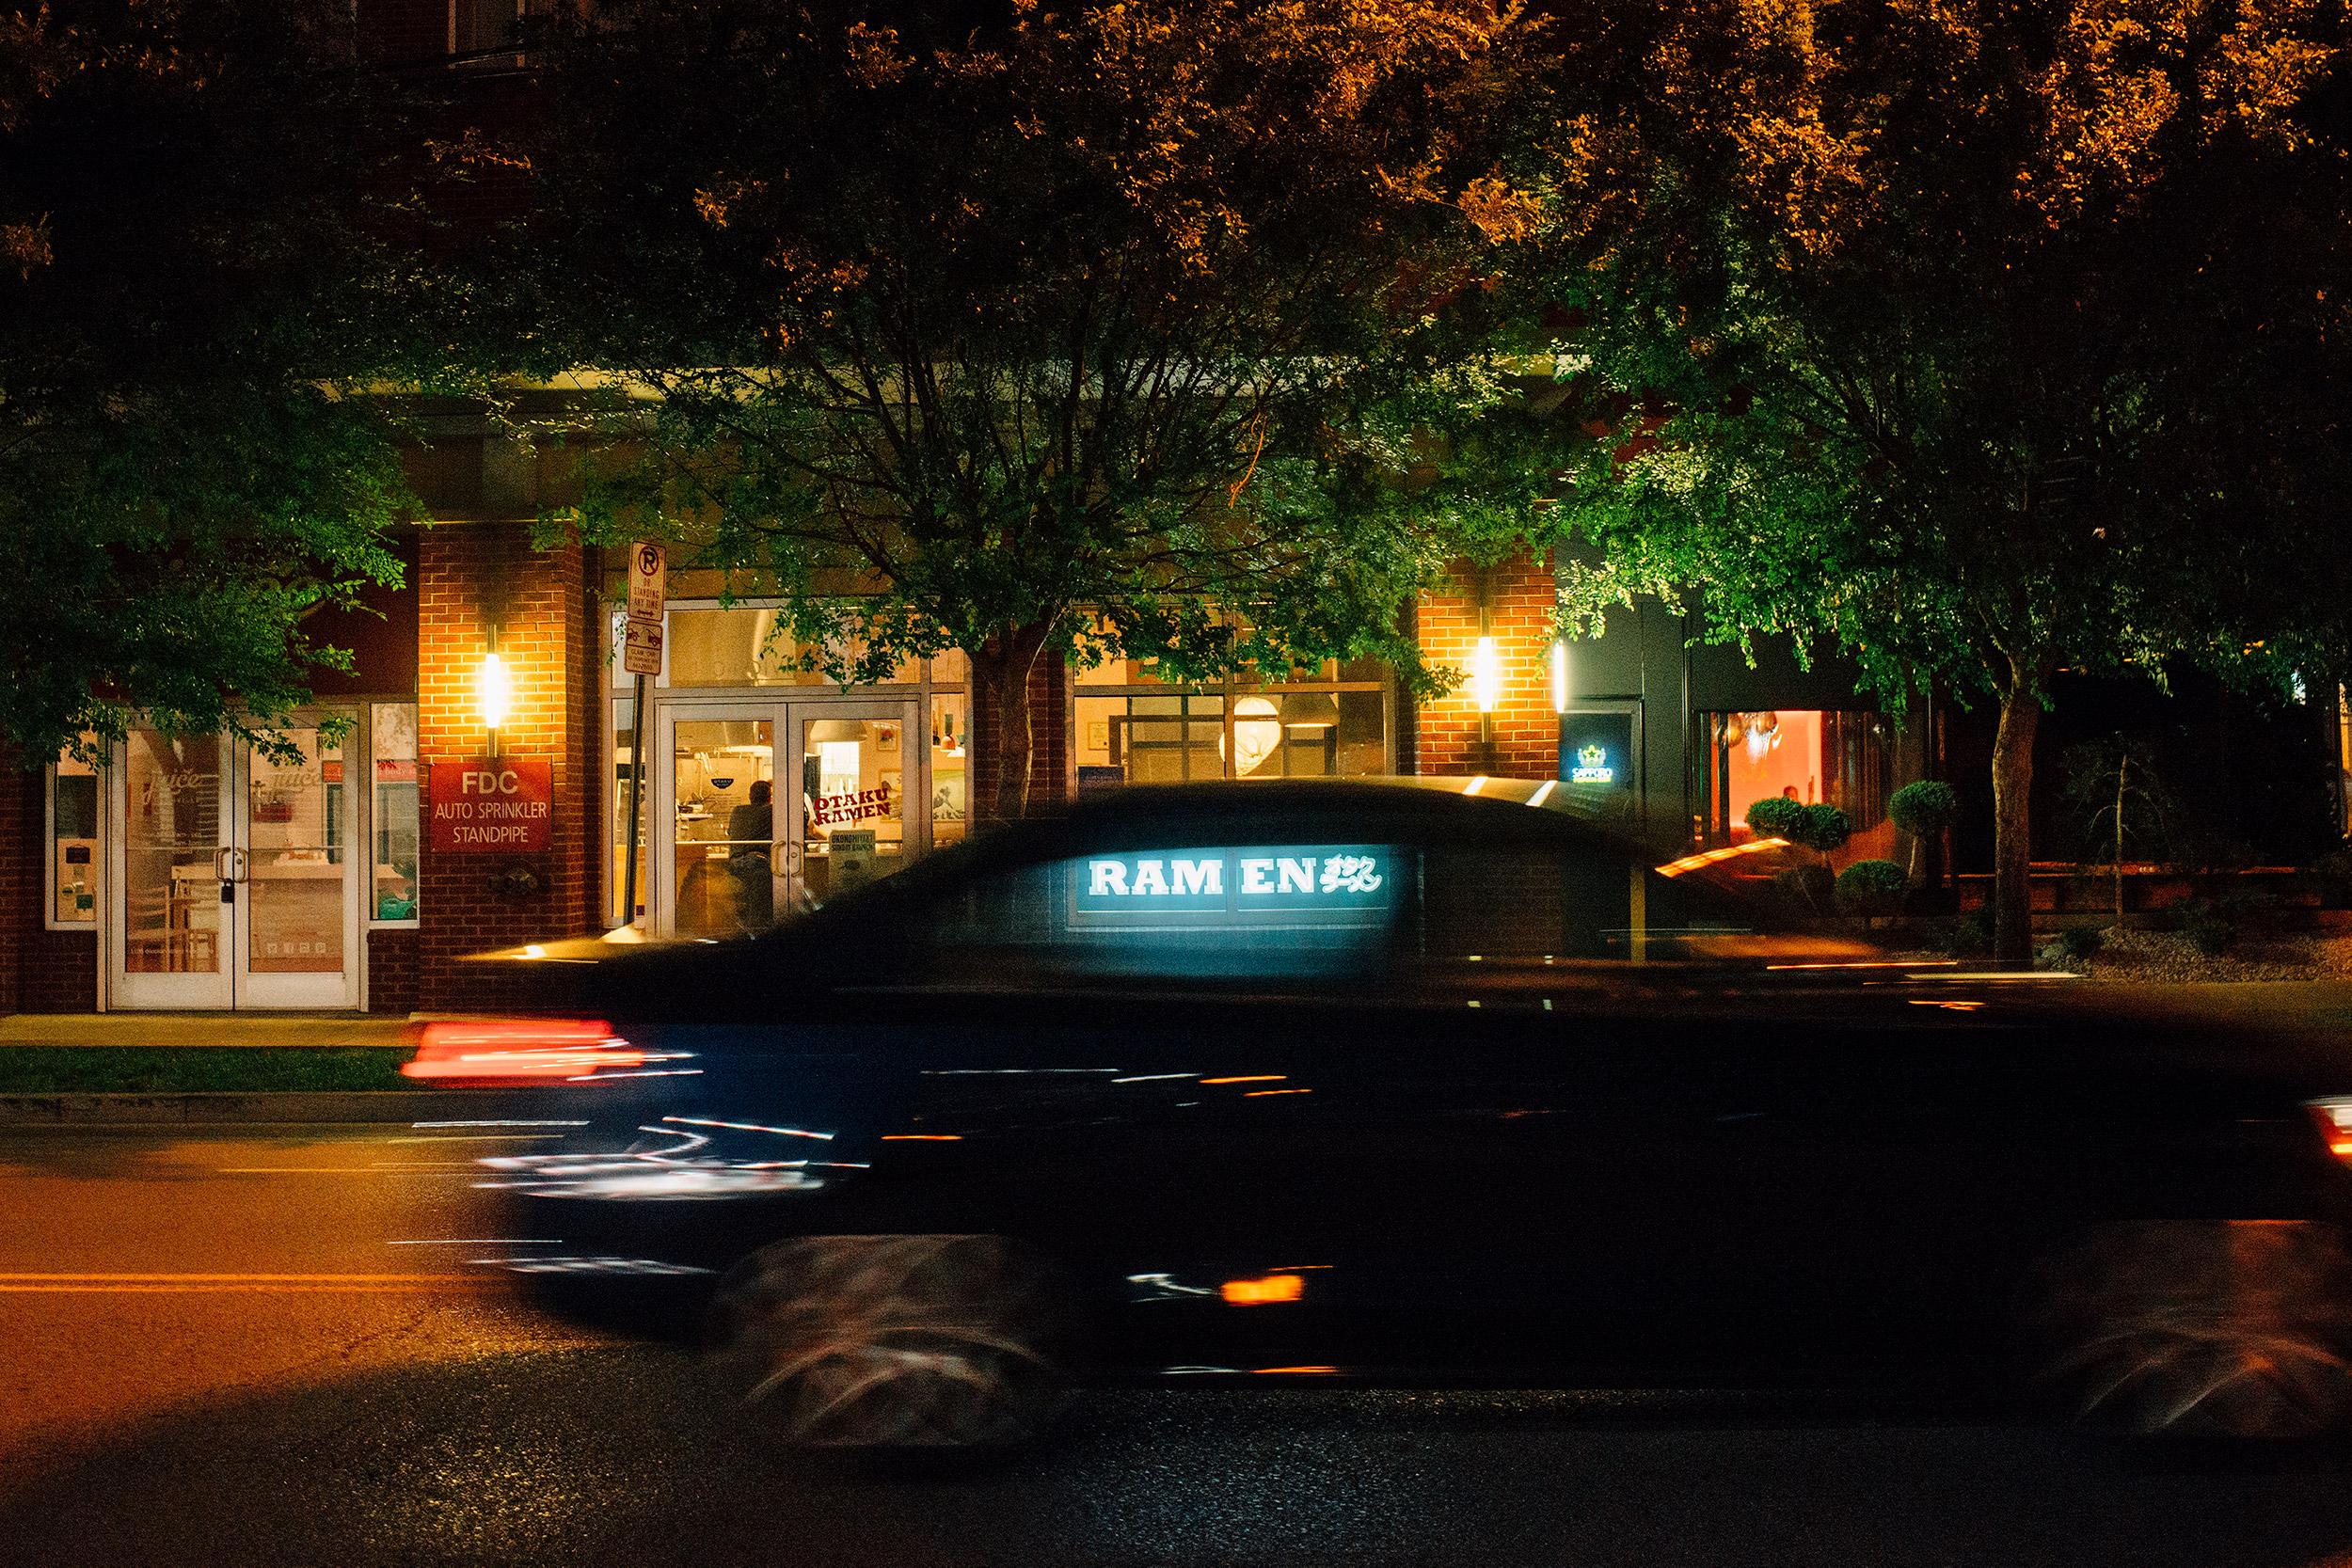 otaku_exterior_night_car.jpg